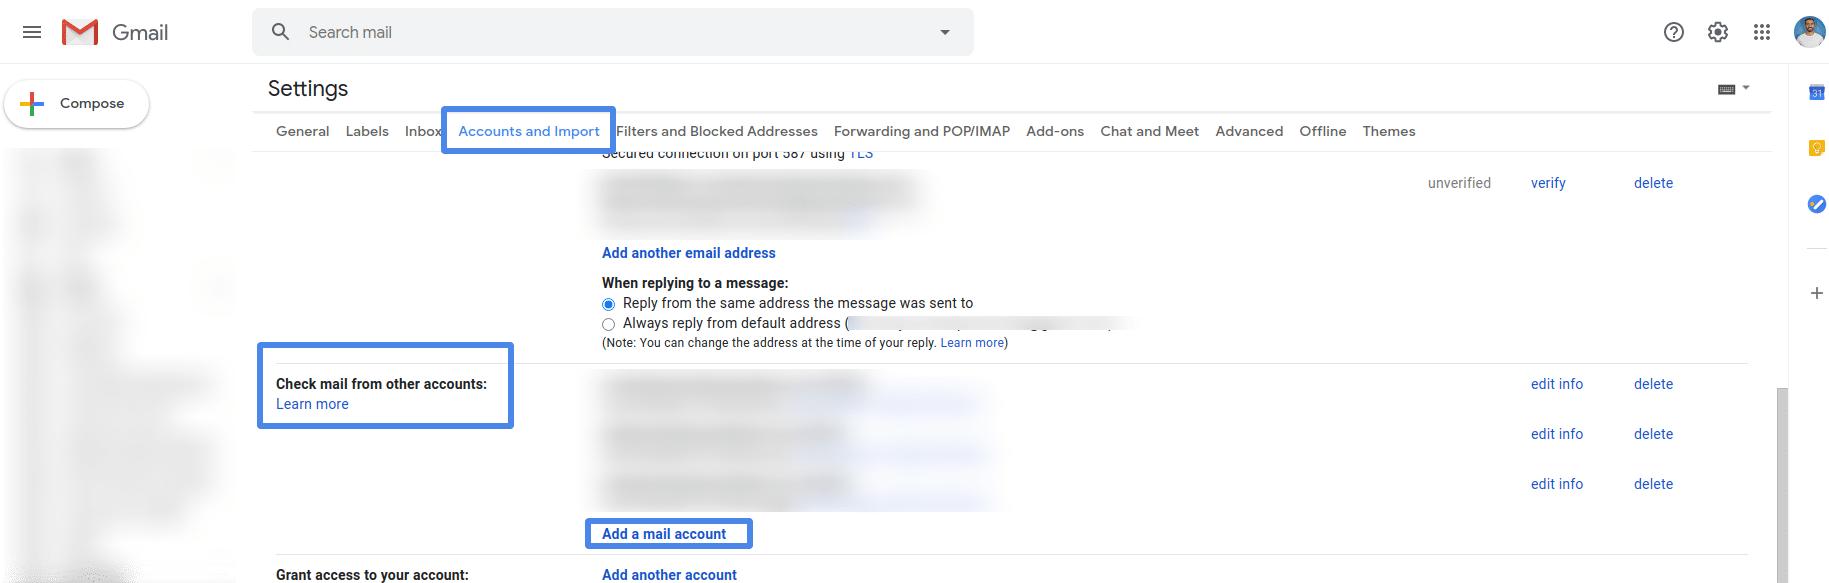 free custom email address gmail add account